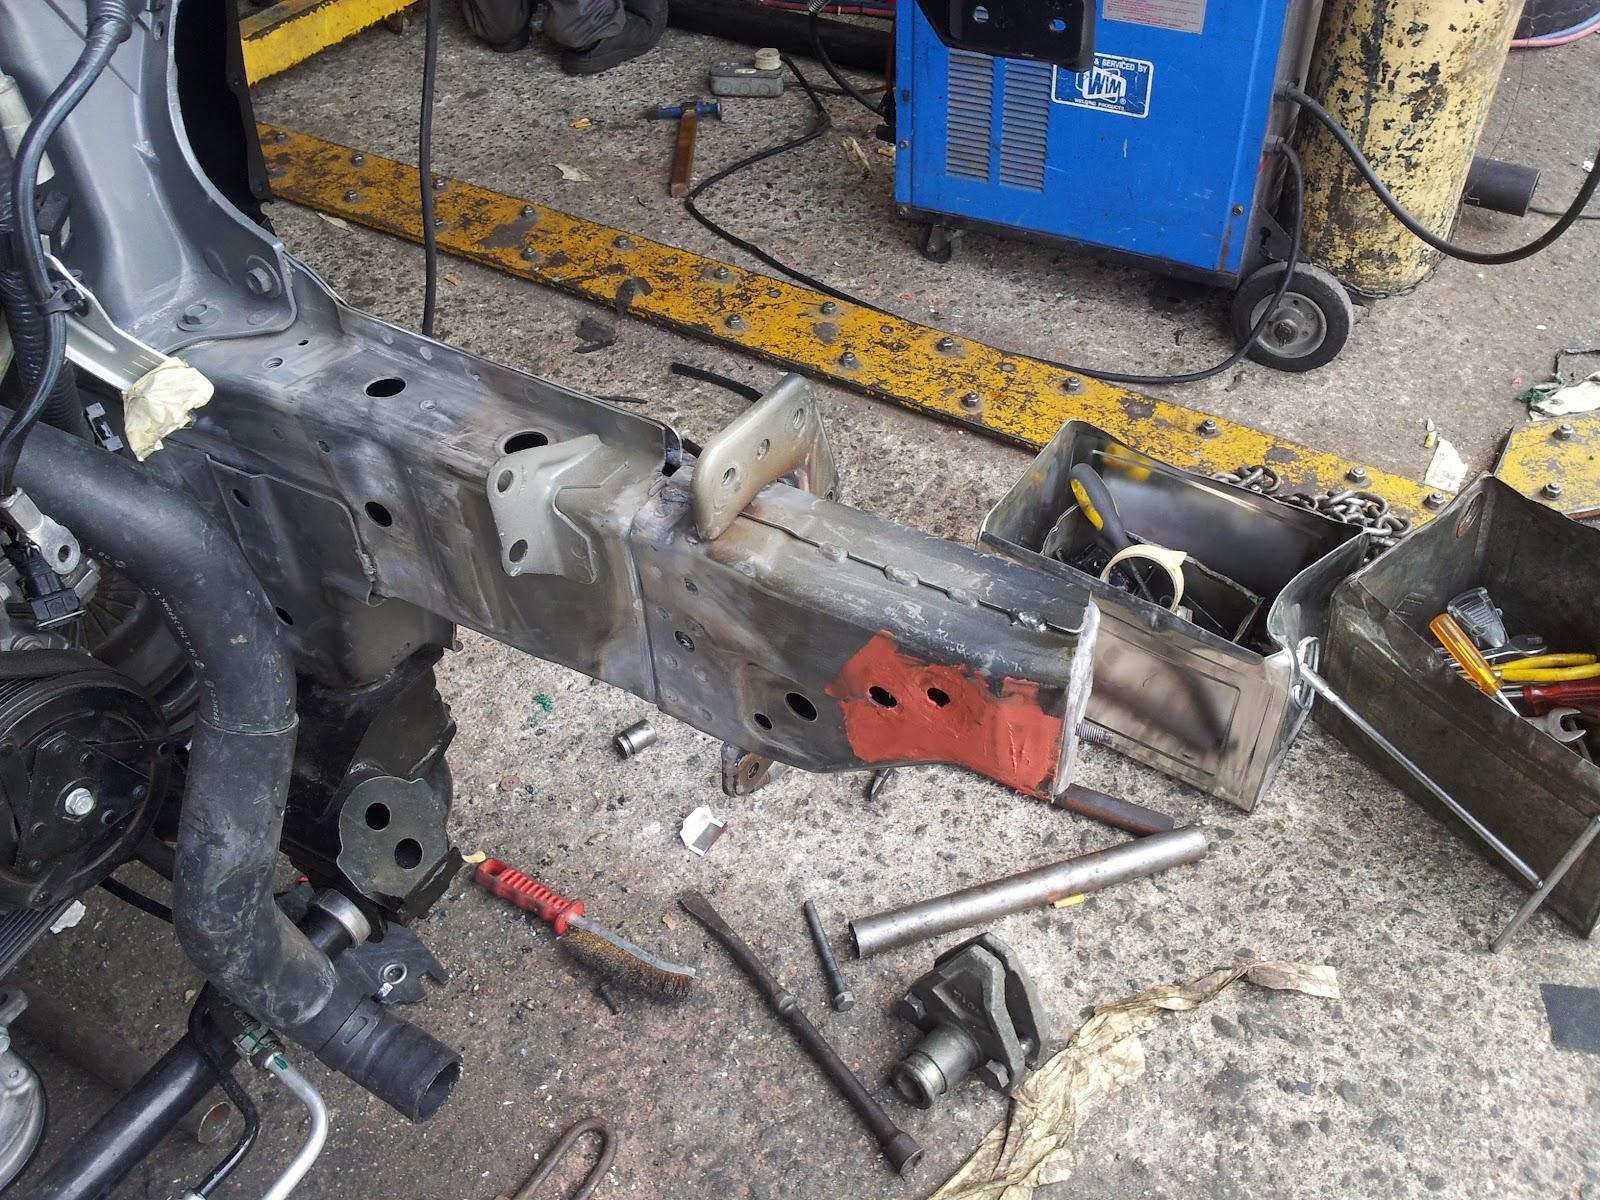 Repairing Car Body A Good Investment